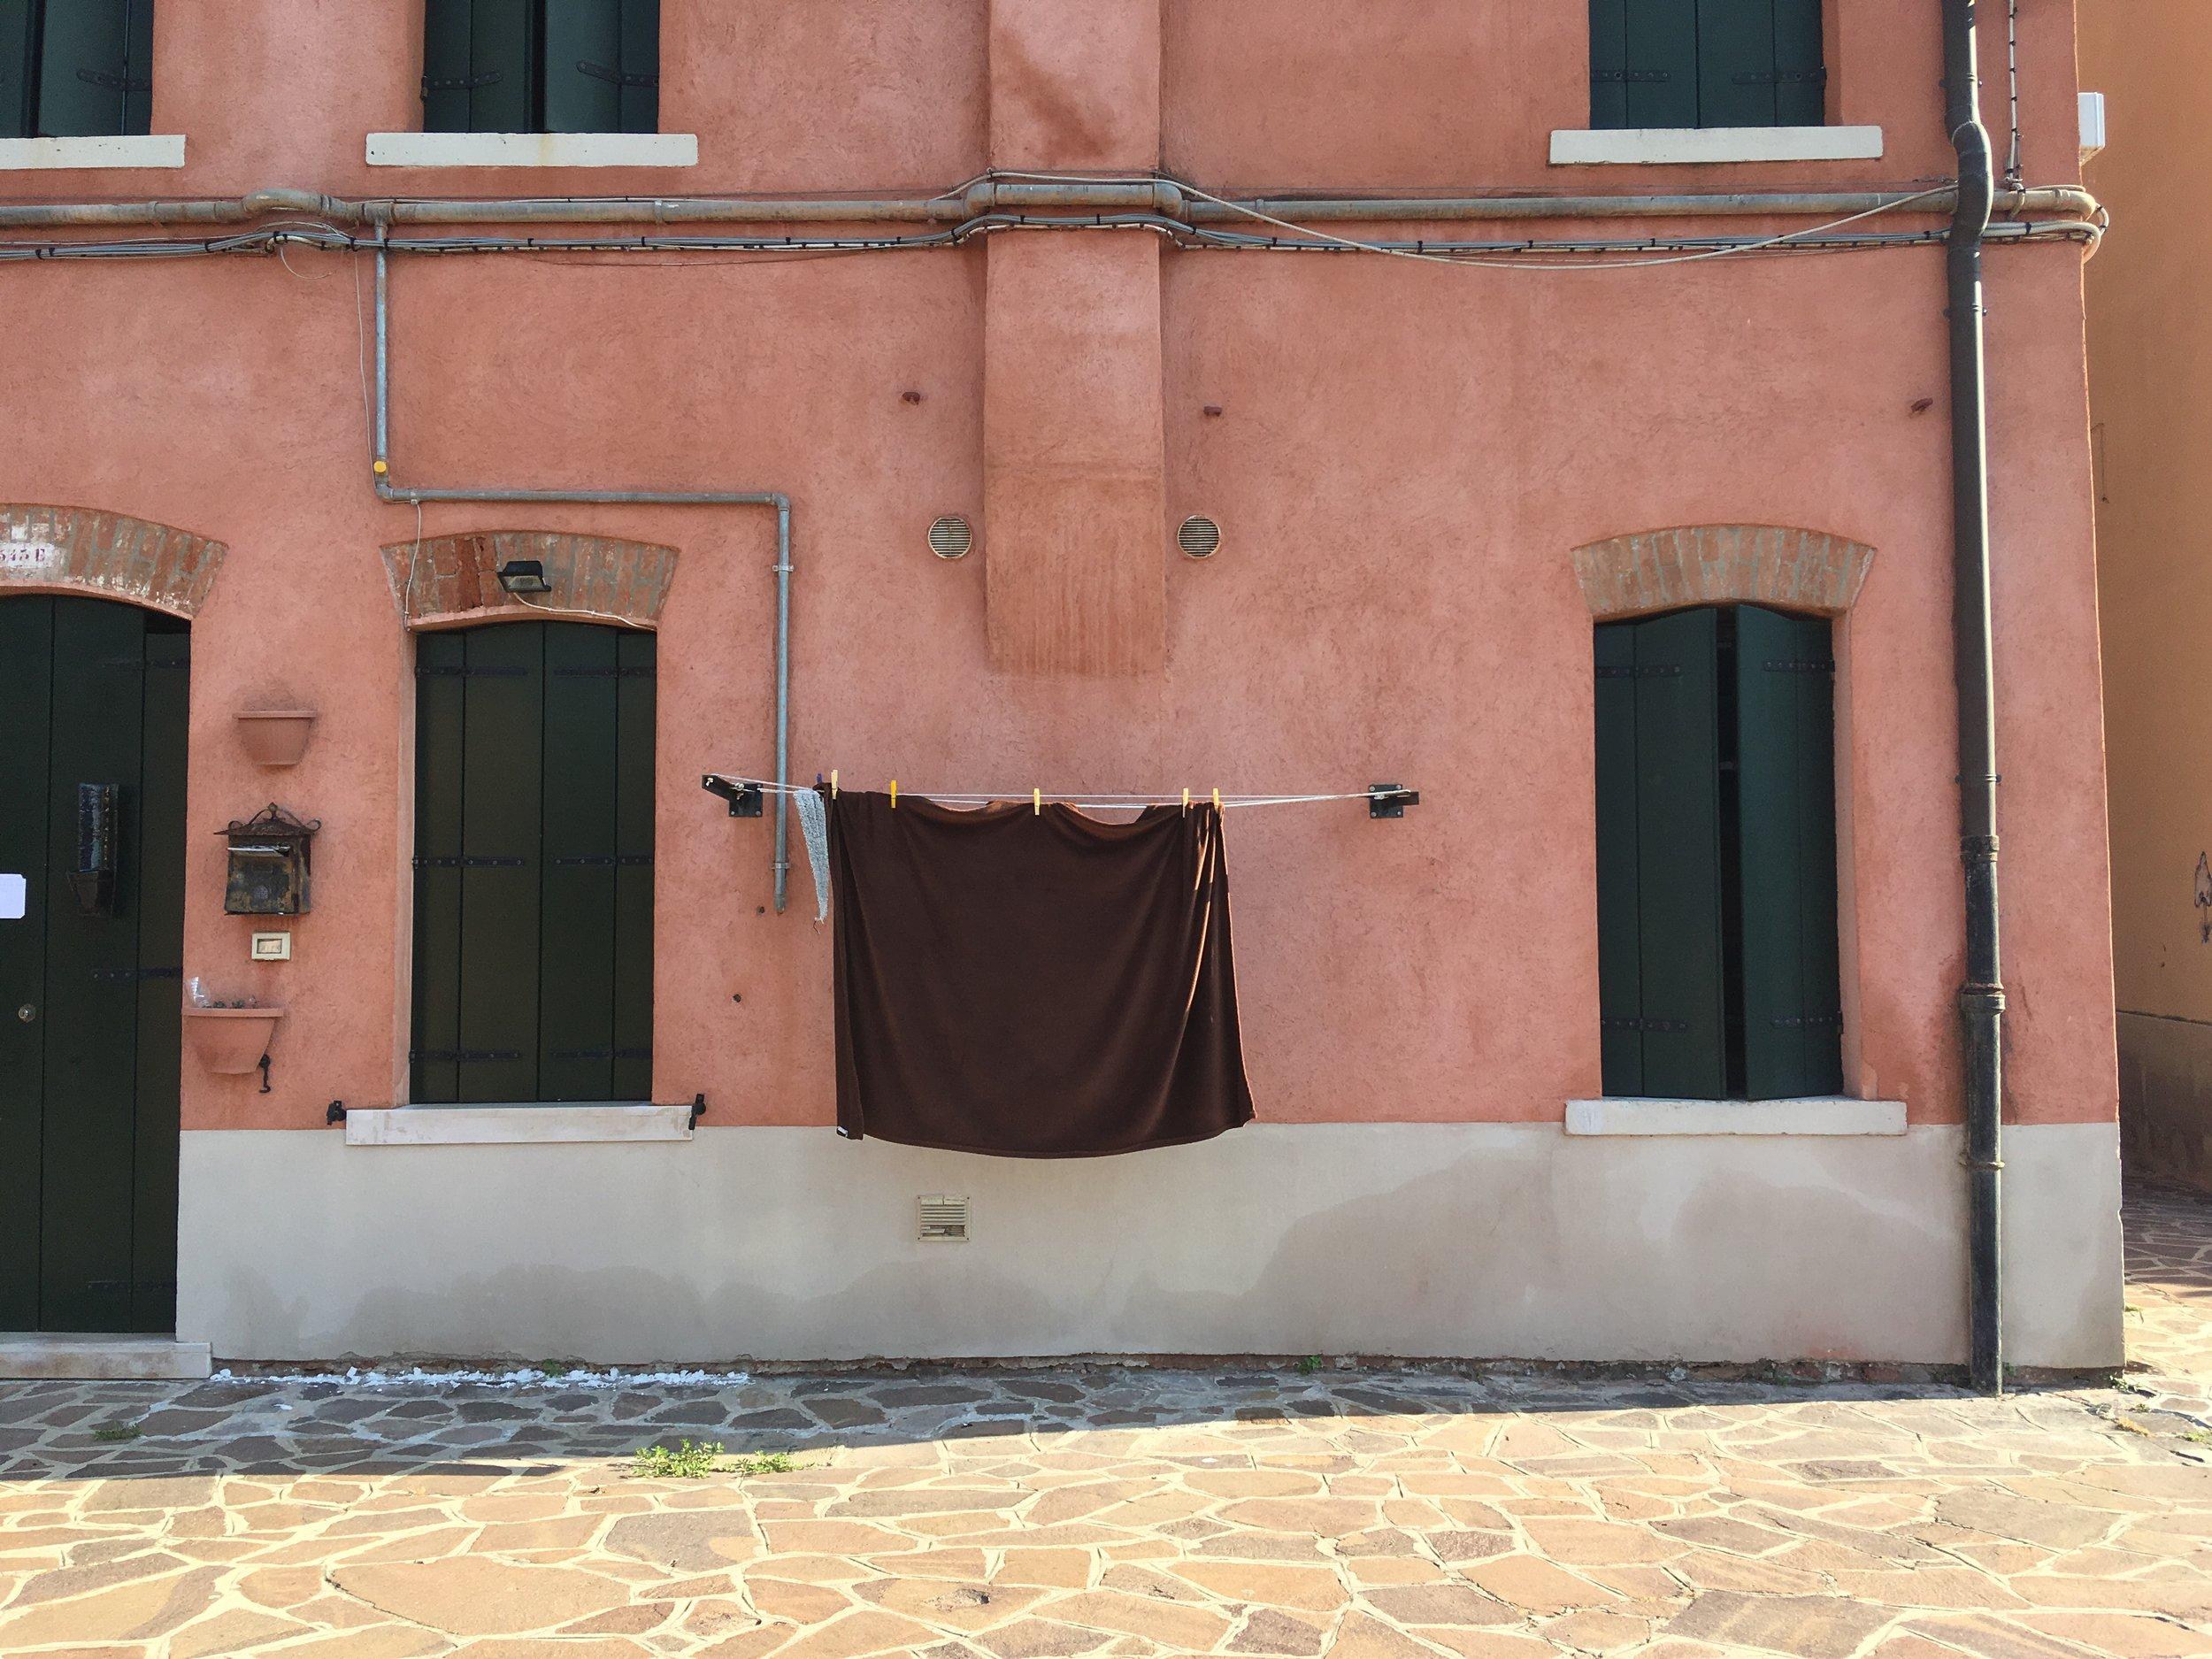 venice, italy, giudecca, travelitaly, best places in italy, doors in italy, doorbells in italy, carlo scarpa, laundry in italy, streets of venice